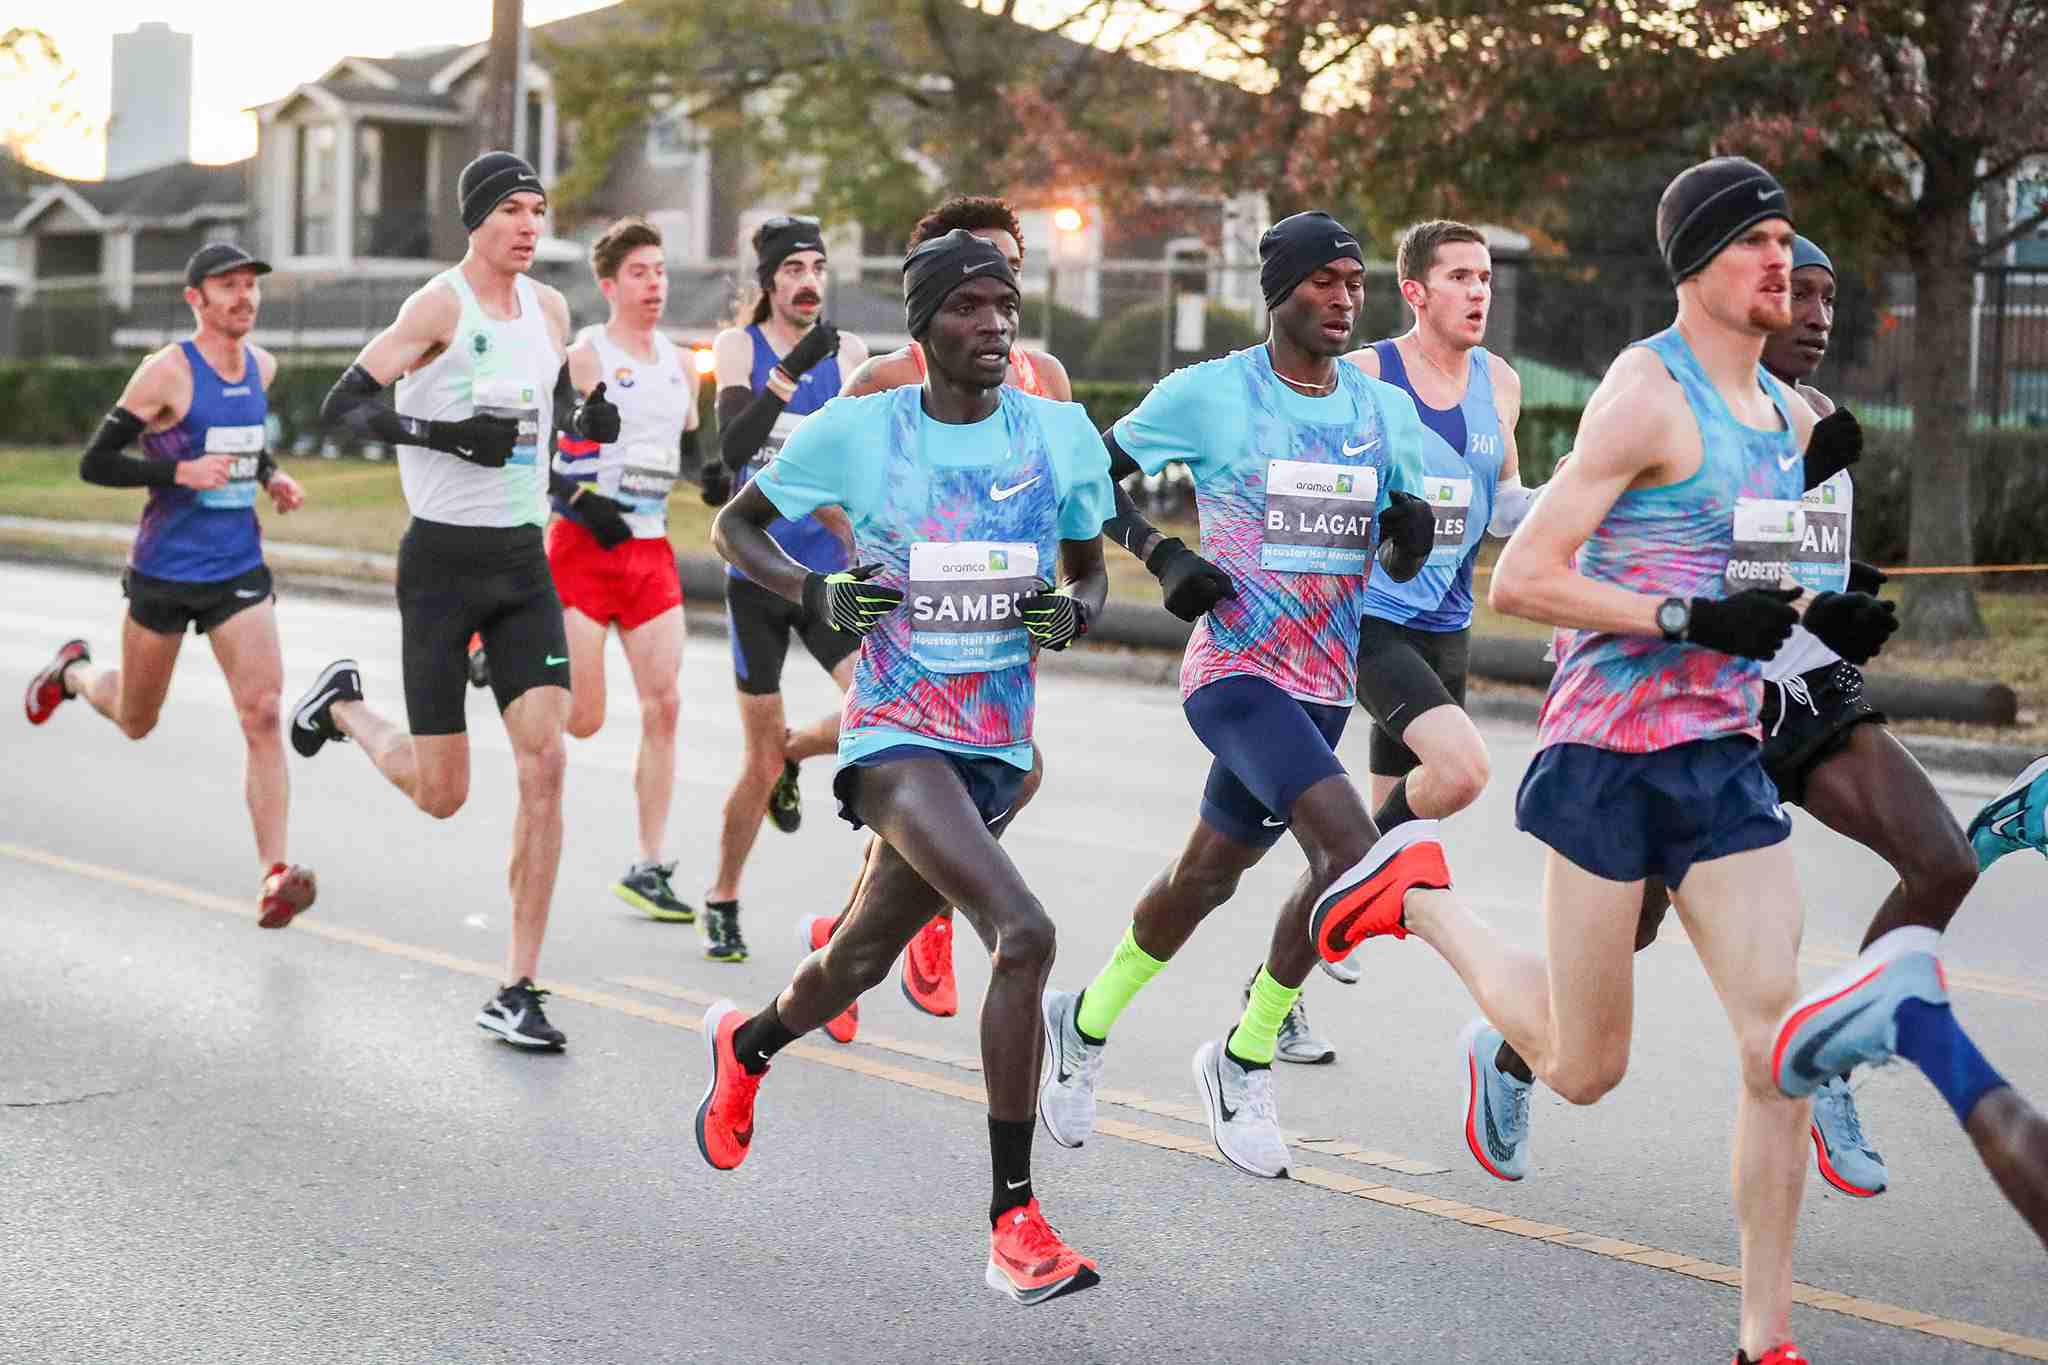 Runners in the Chevron Houston Marathon